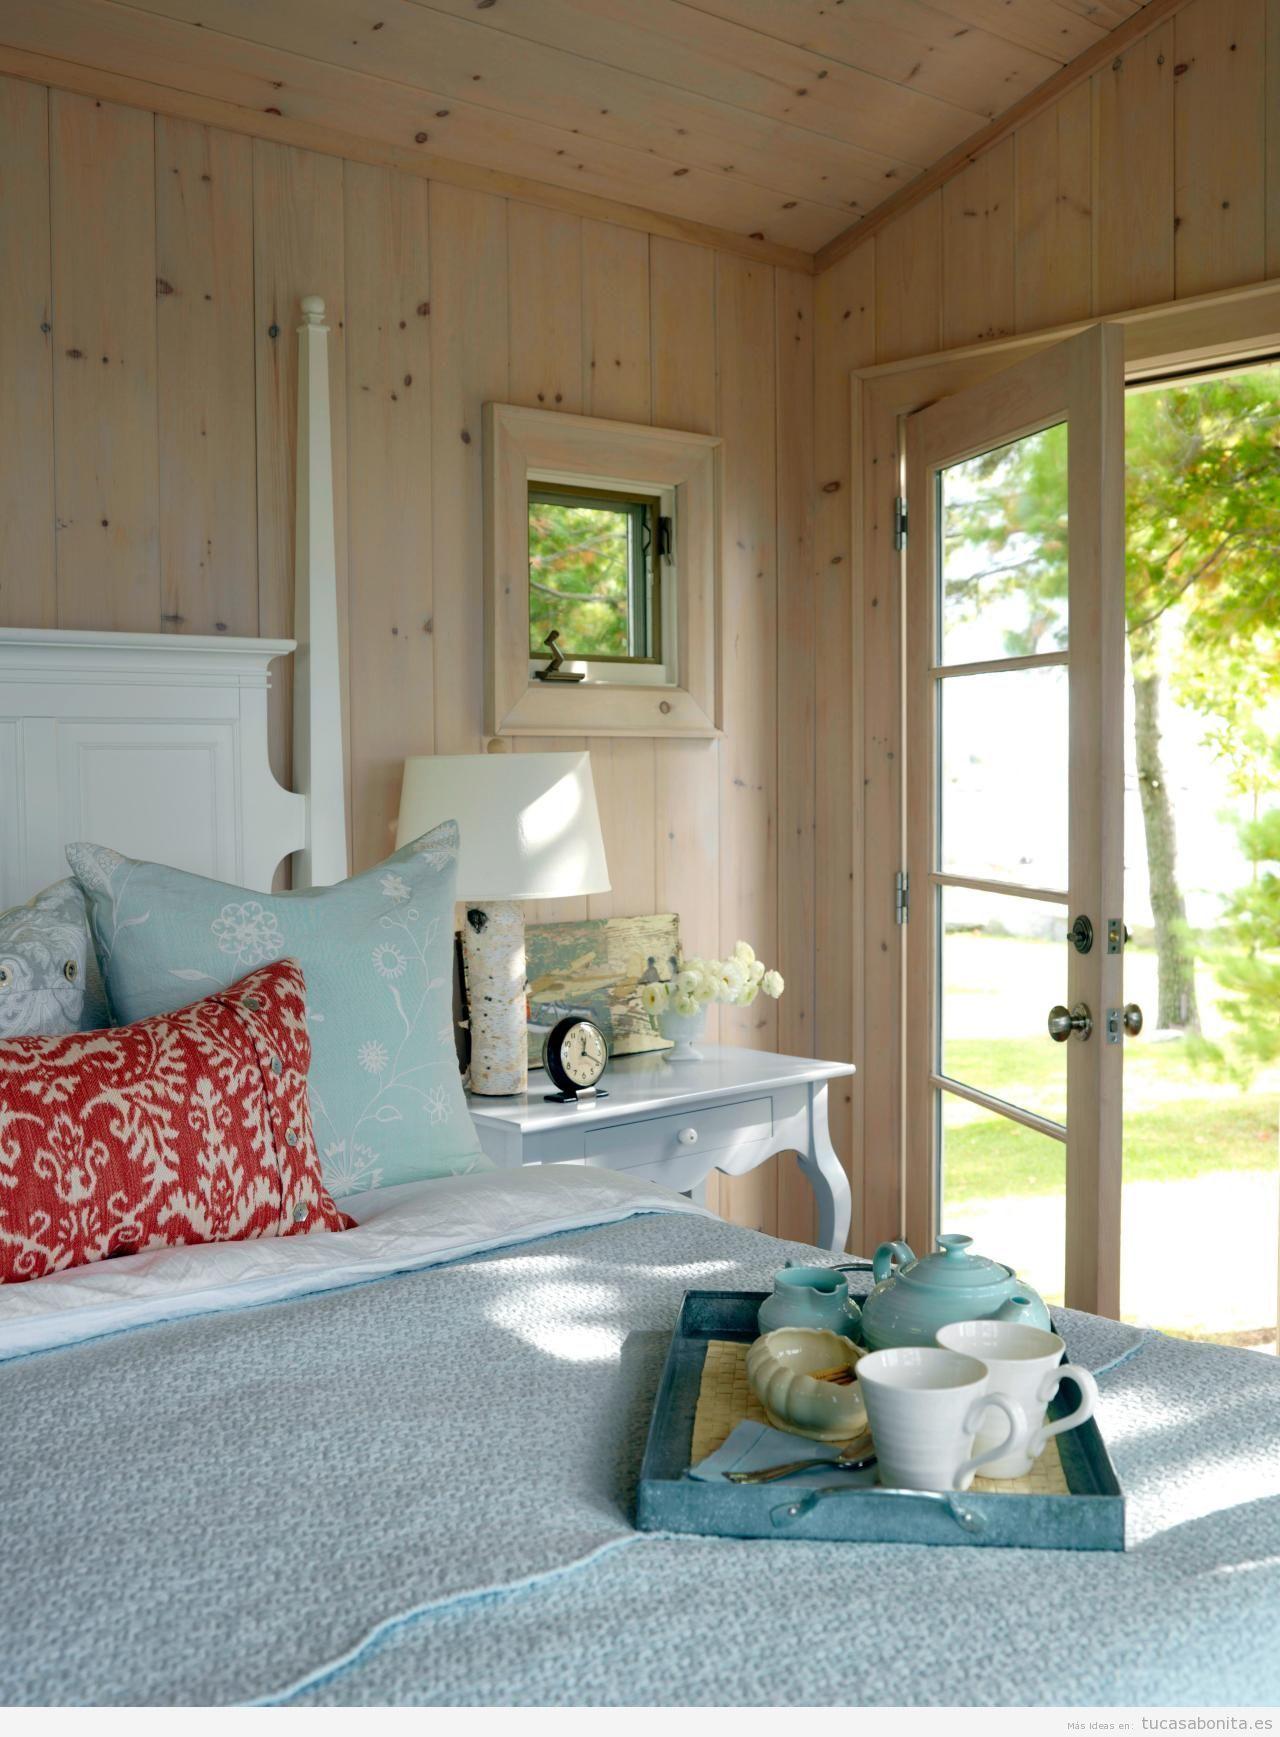 Ideas Decorar Dormitorio Matrimonio Distintos Estilos 10 Ideas - Decorar-un-dormitorio-de-matrimonio